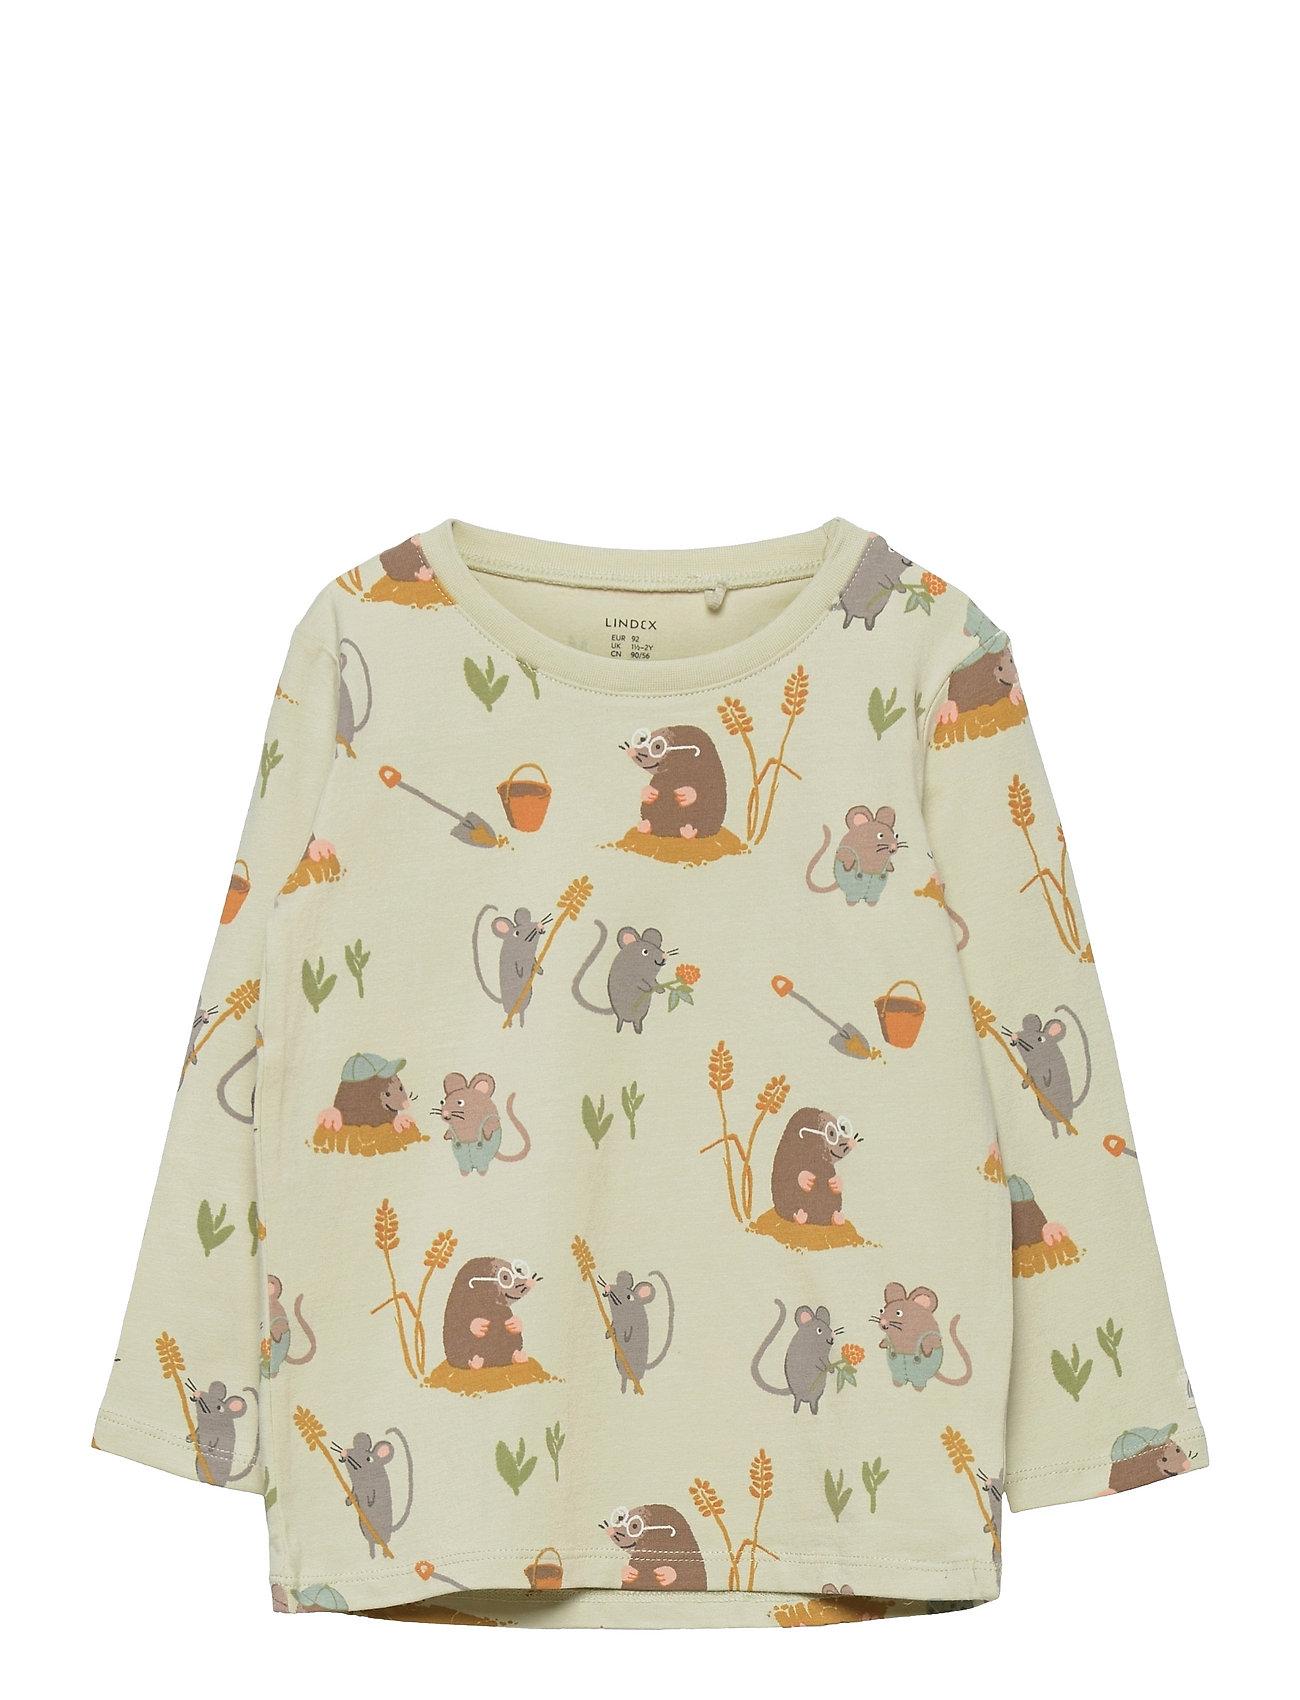 Top Mole And Friends Langærmet T-shirt Gul Lindex